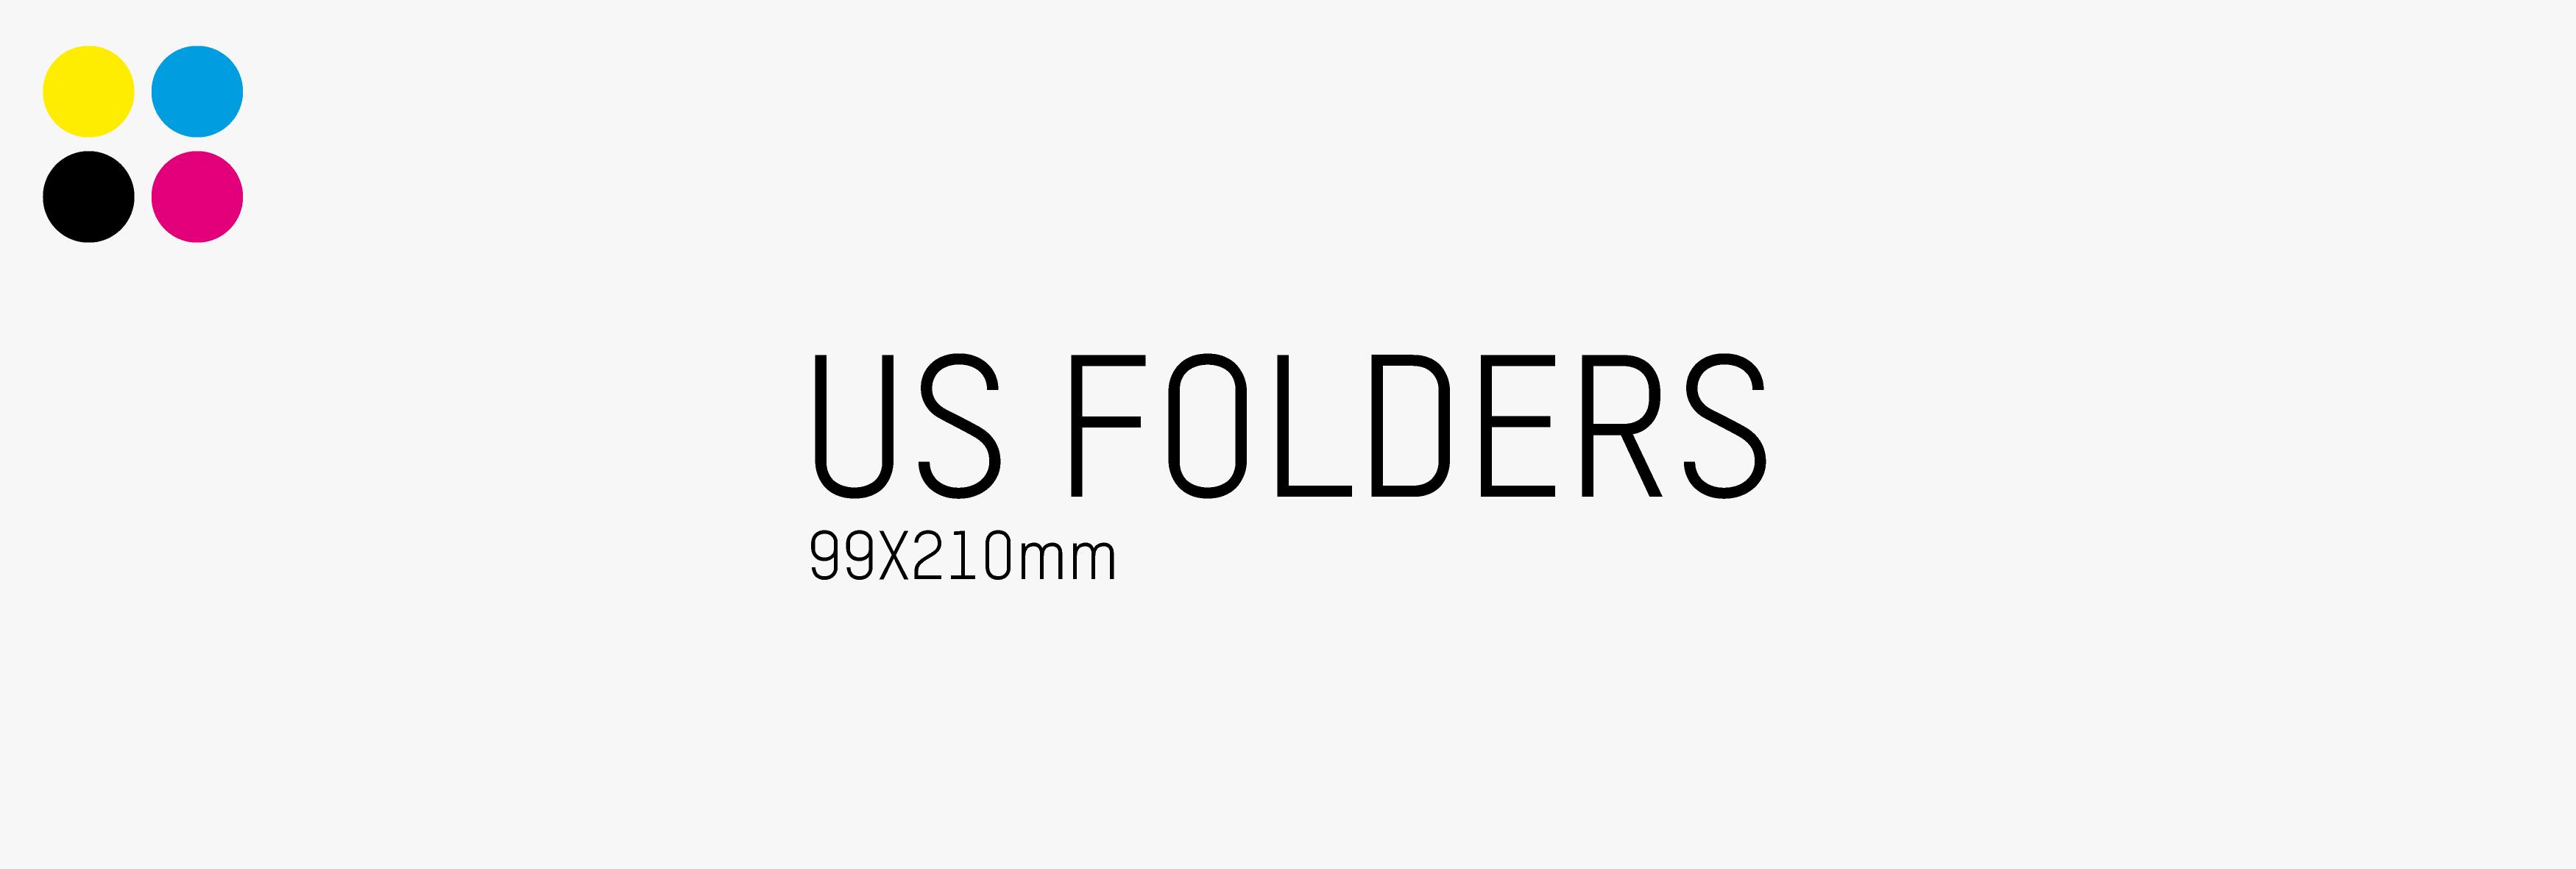 US-folders